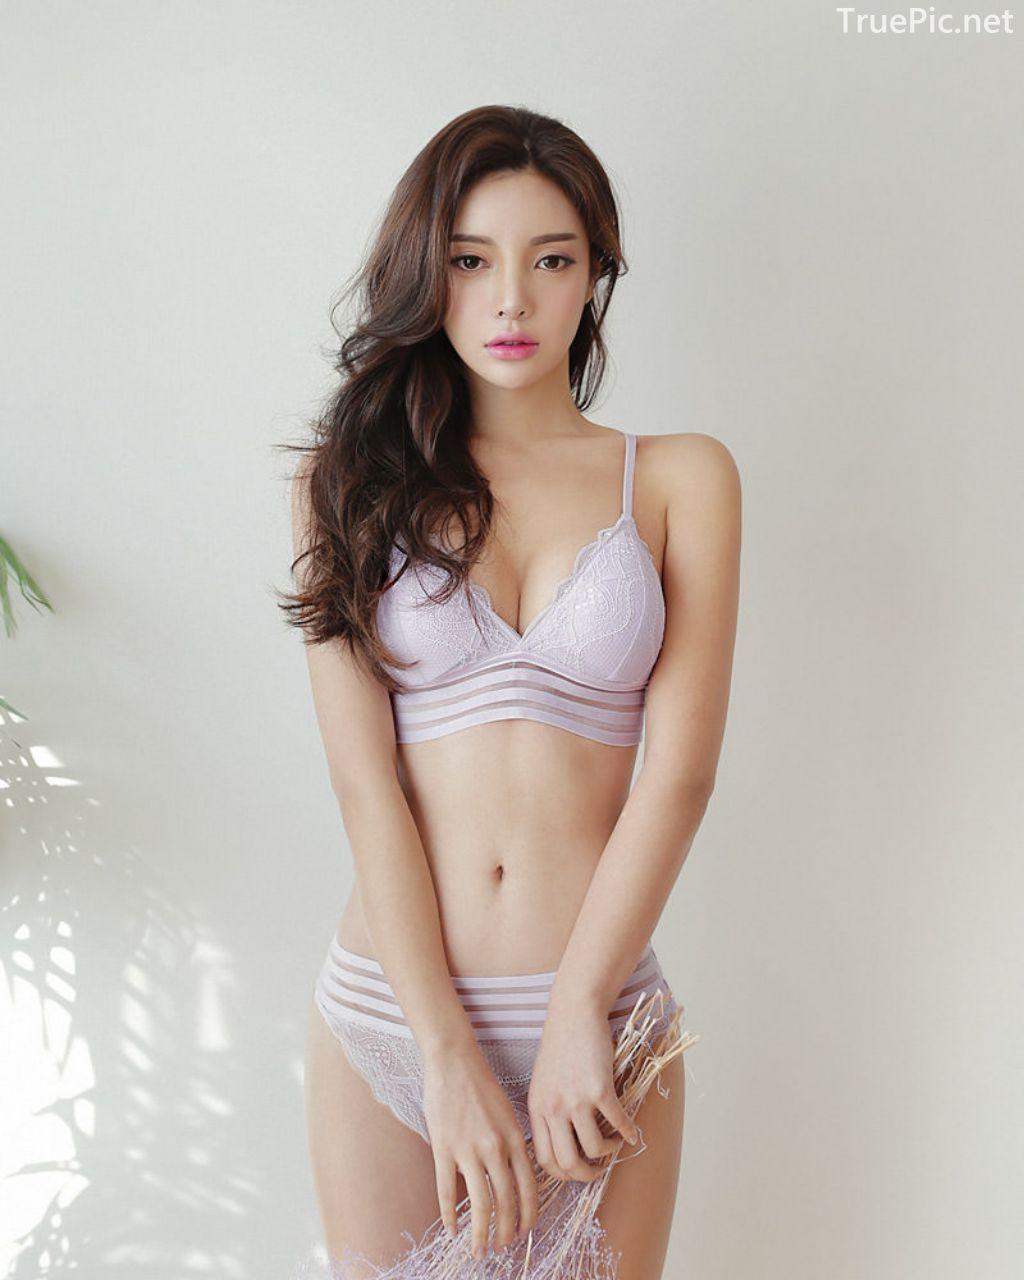 Jin Hee Korean Fashion Model - Love Me Lingerie Collection - TruePic.net - Picture 3